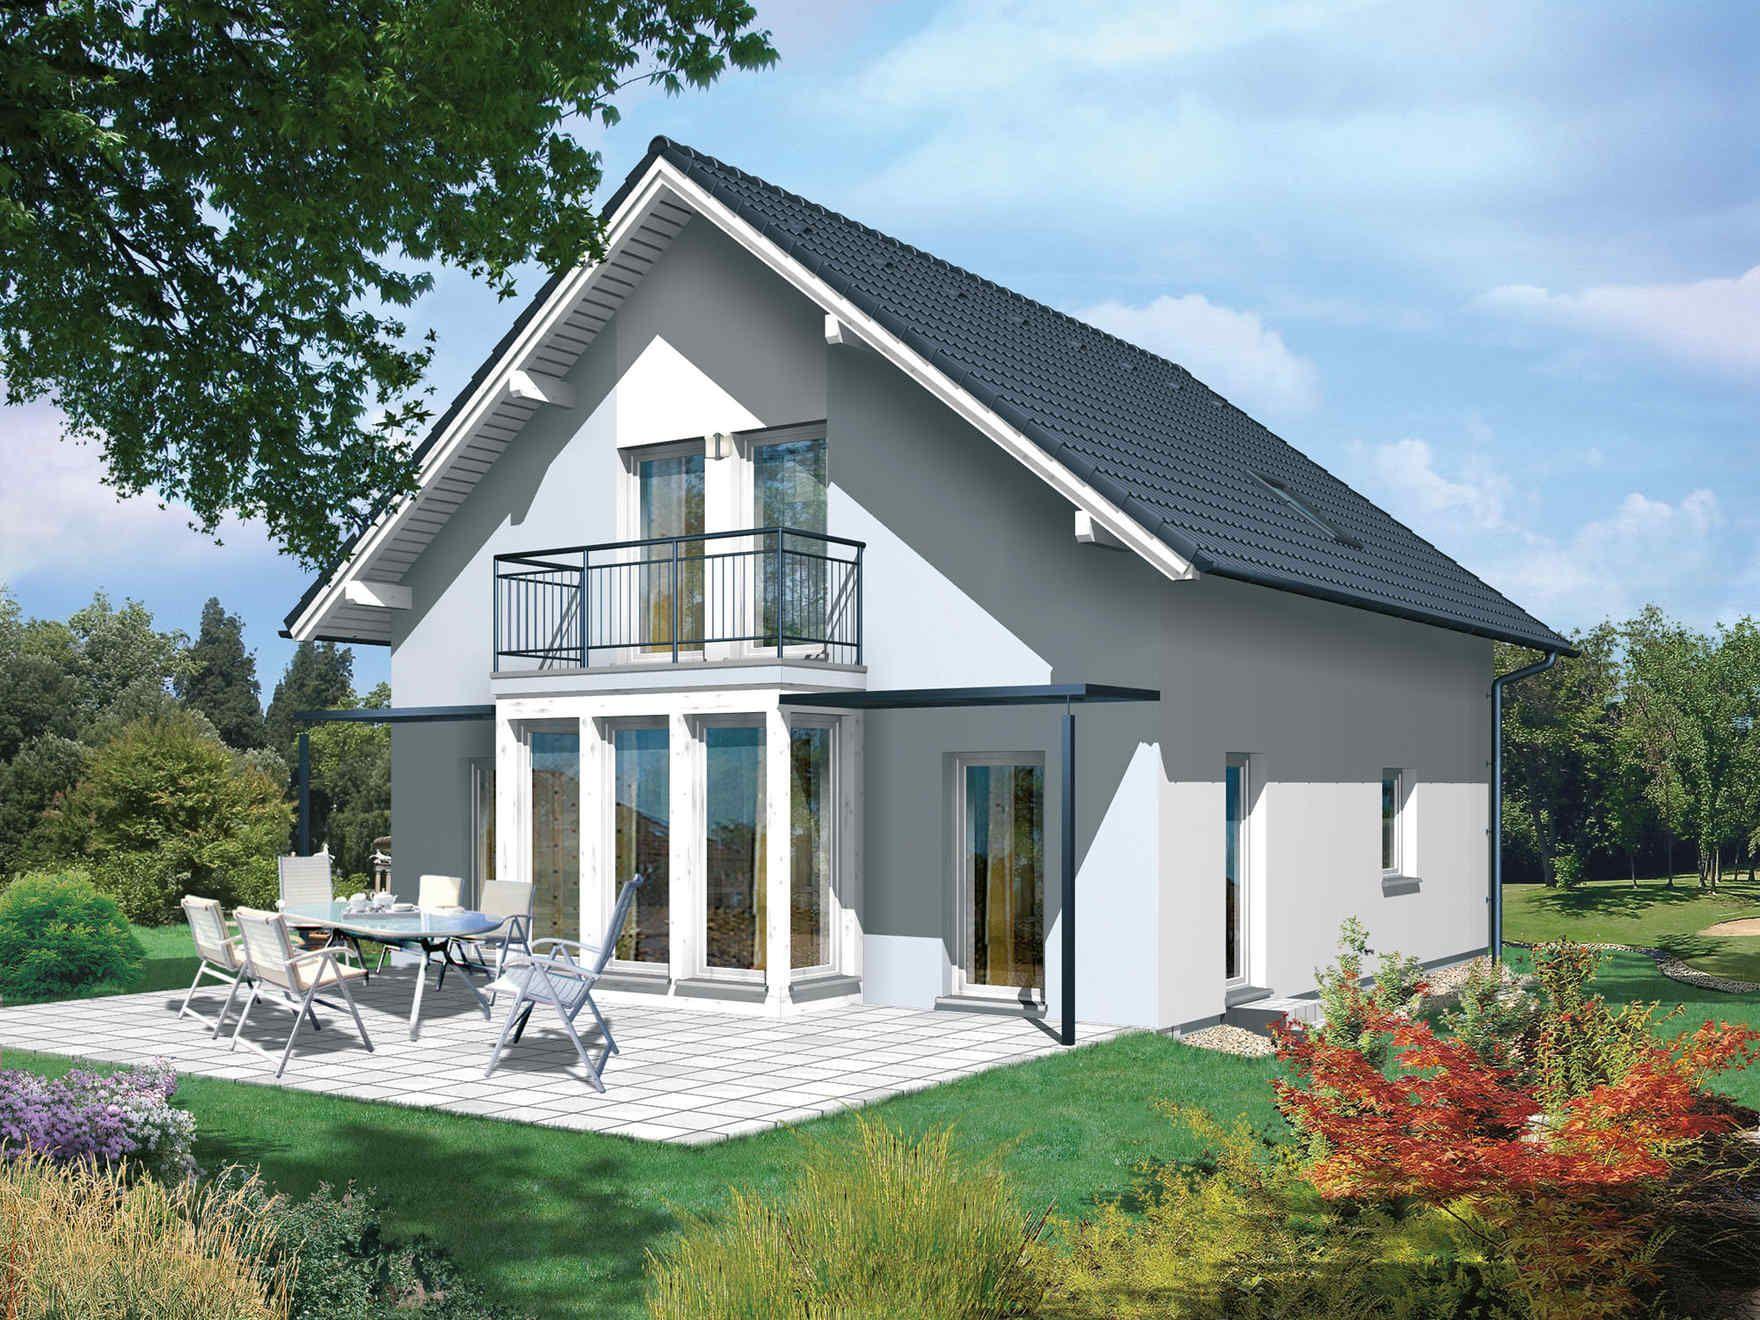 Vario Haus vario haus family viii gibtdemlebeneinzuhause einfamilienhaus